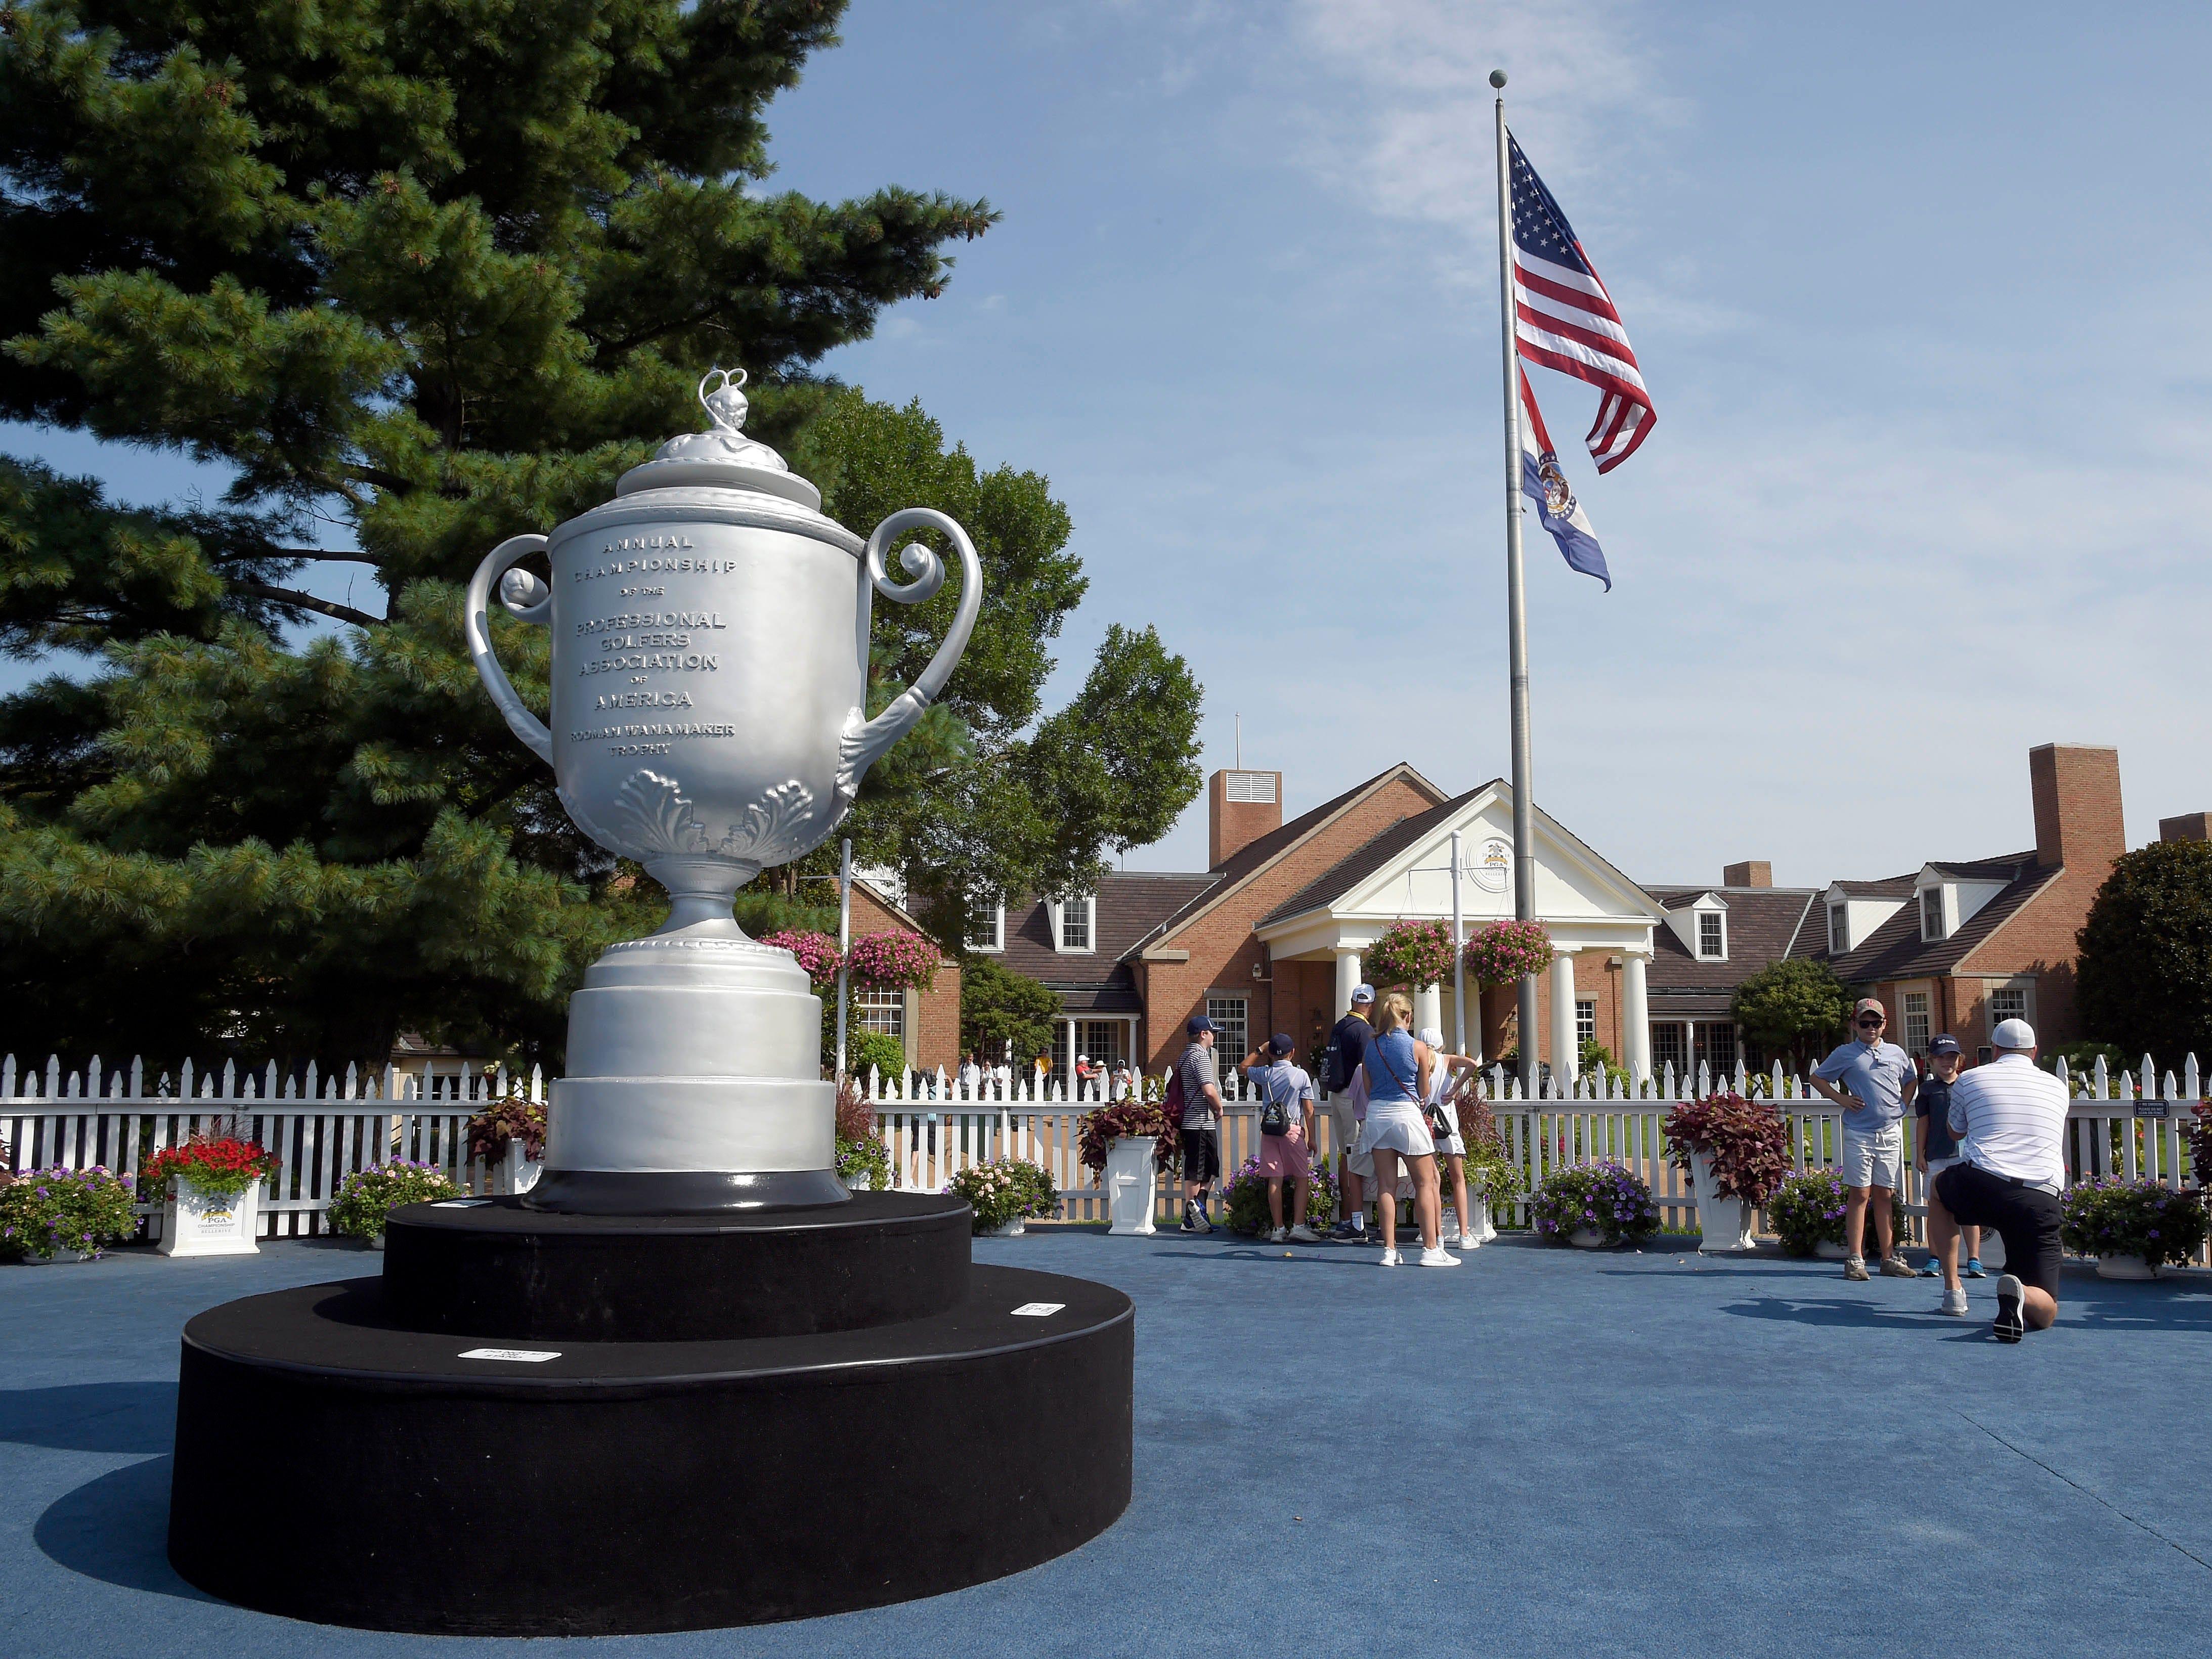 An oversized mockup of the Wanamaker Trophy.